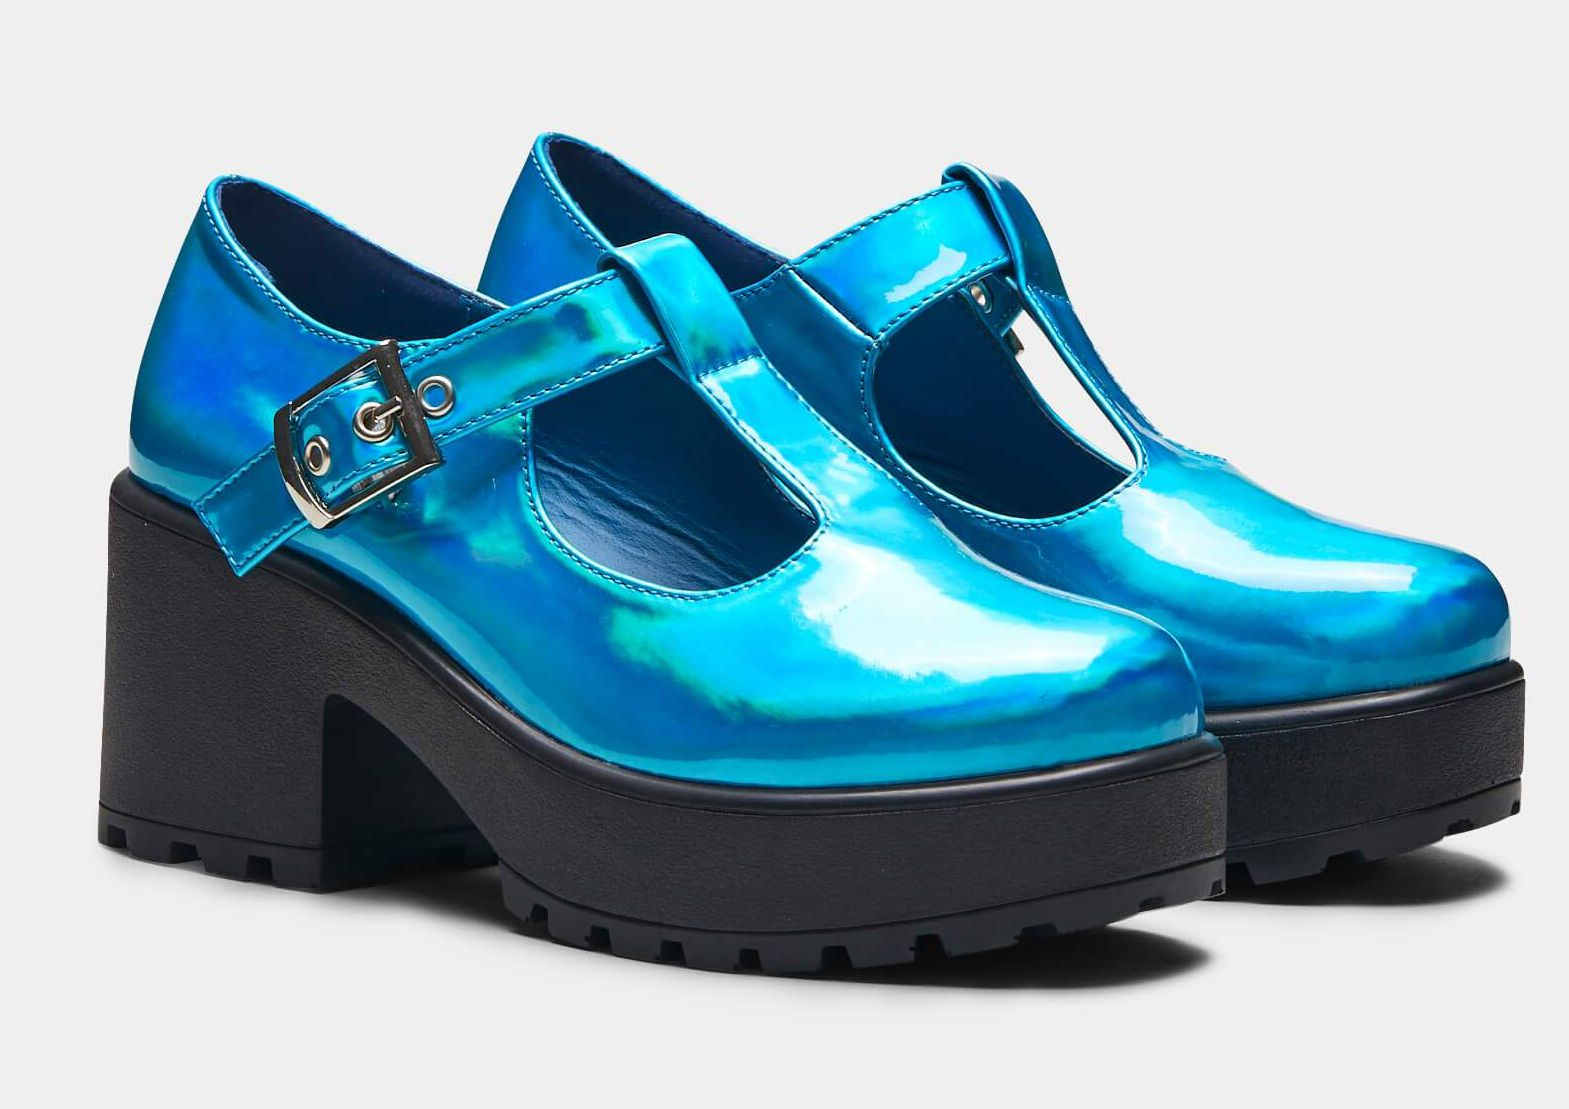 kfnd35mblu_chaussures-mary-janes-lolita-glam-rock-sai-bleu-metallique